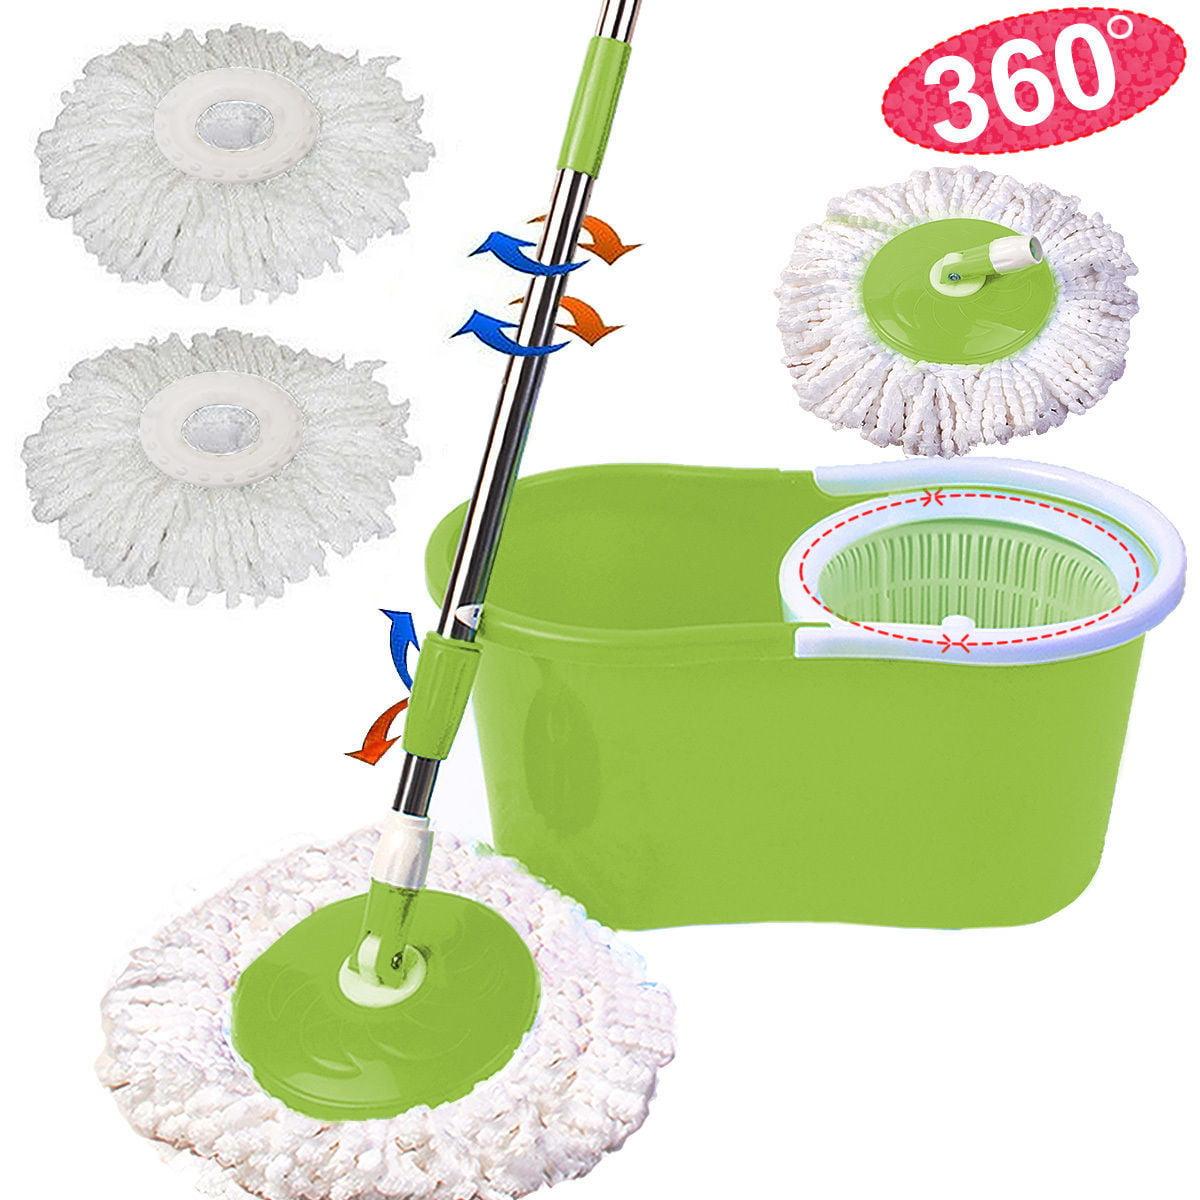 Zimtown Microfiber Spining Magic Mop W/Bucket 2 Heads Rotating 360 degree Easy Floor Mop